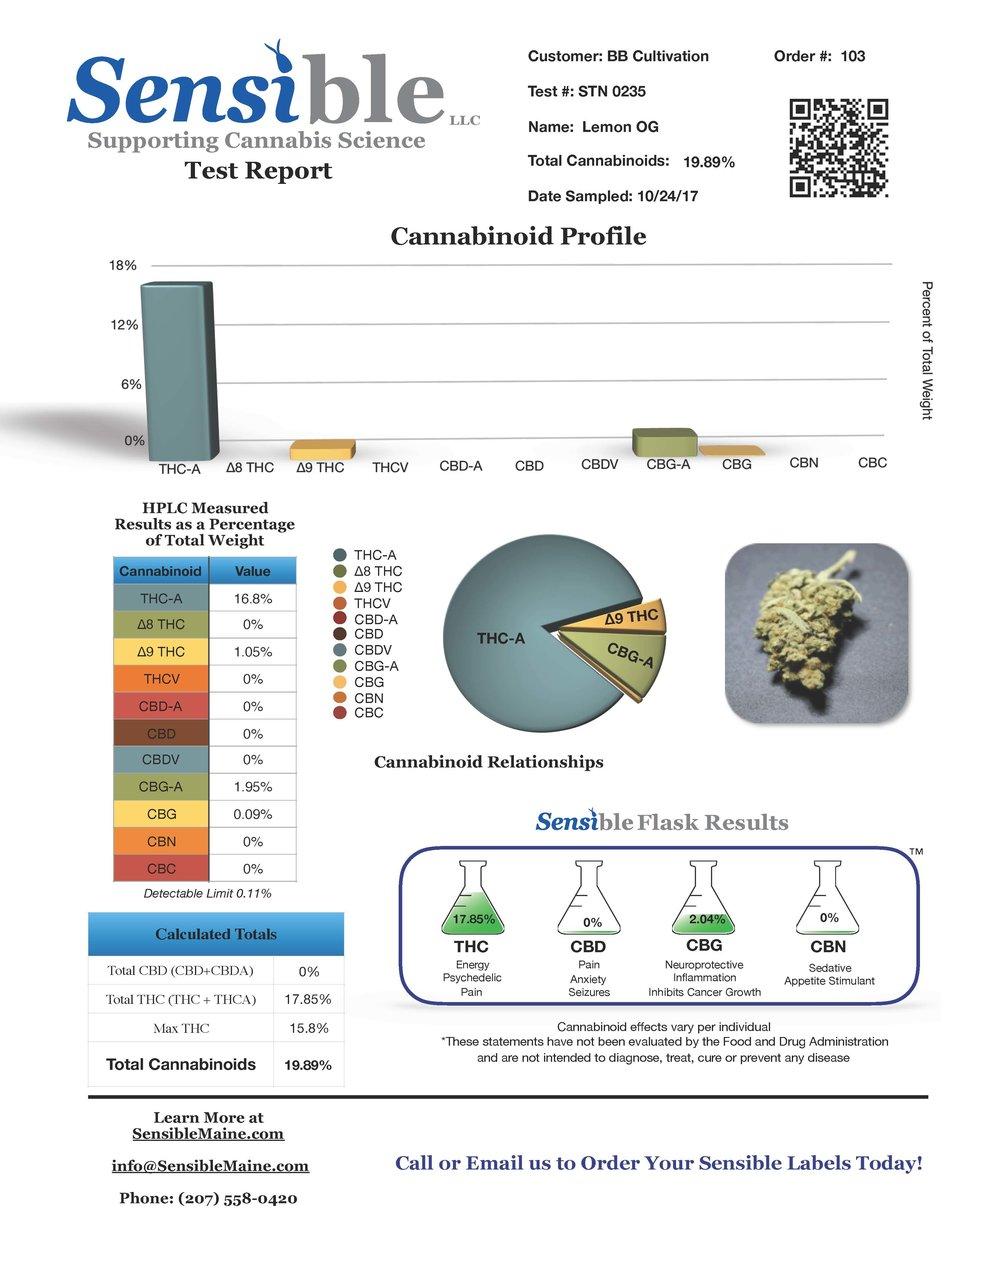 Test Report stn0235.jpg